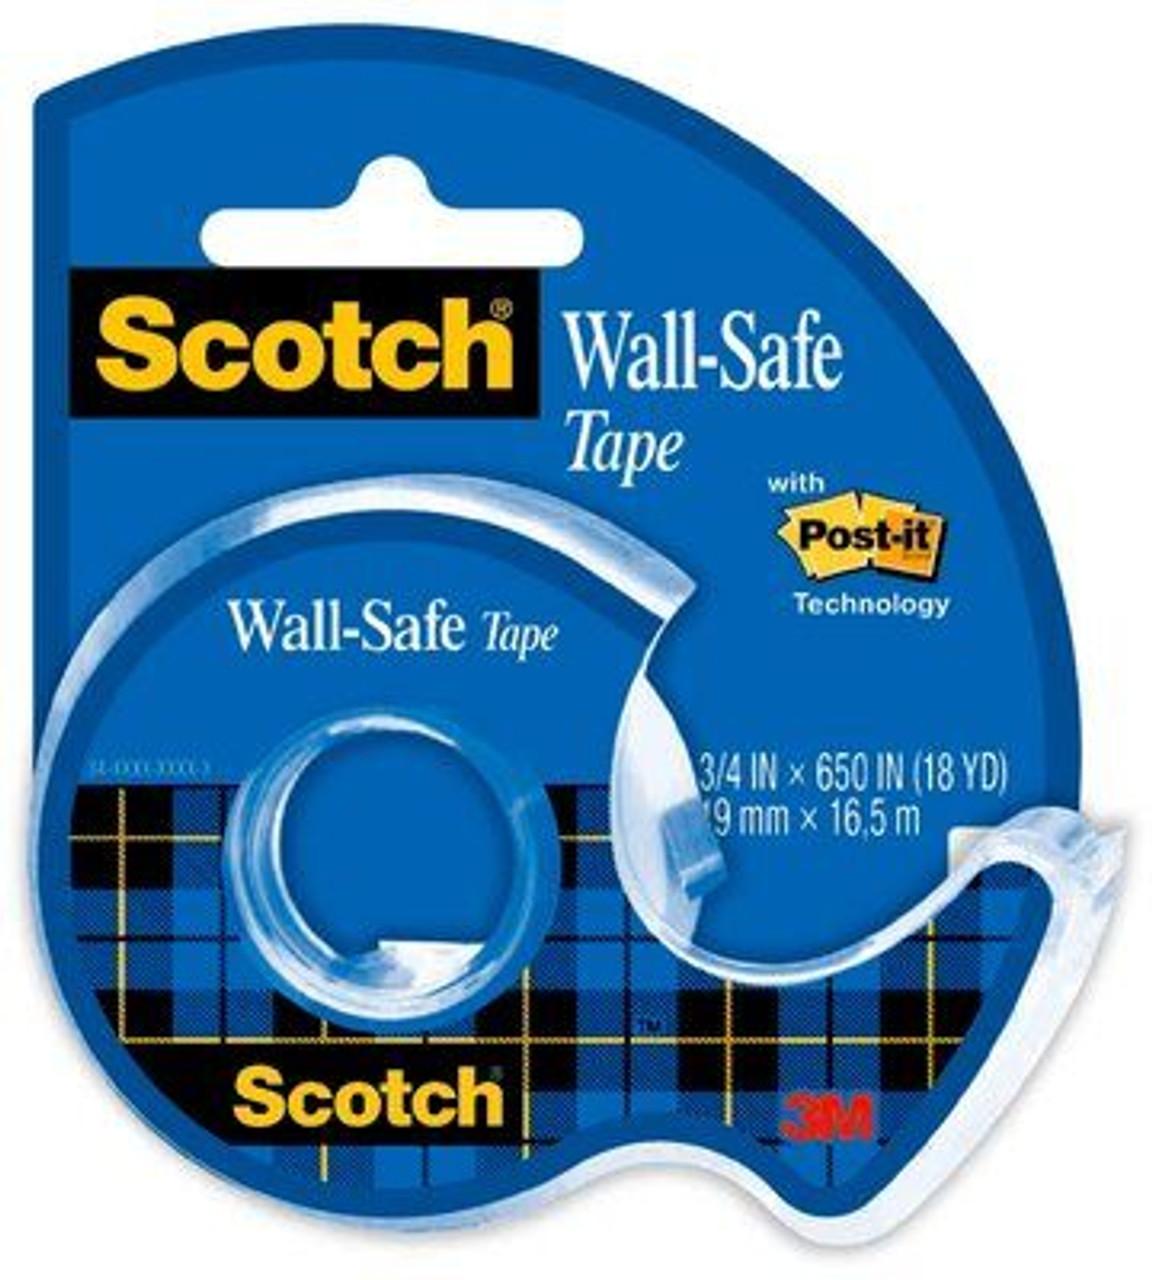 Scotch® Wall-Safe Tape, 183, 3/4 in x 650 in (19 mm x 16.5 m)